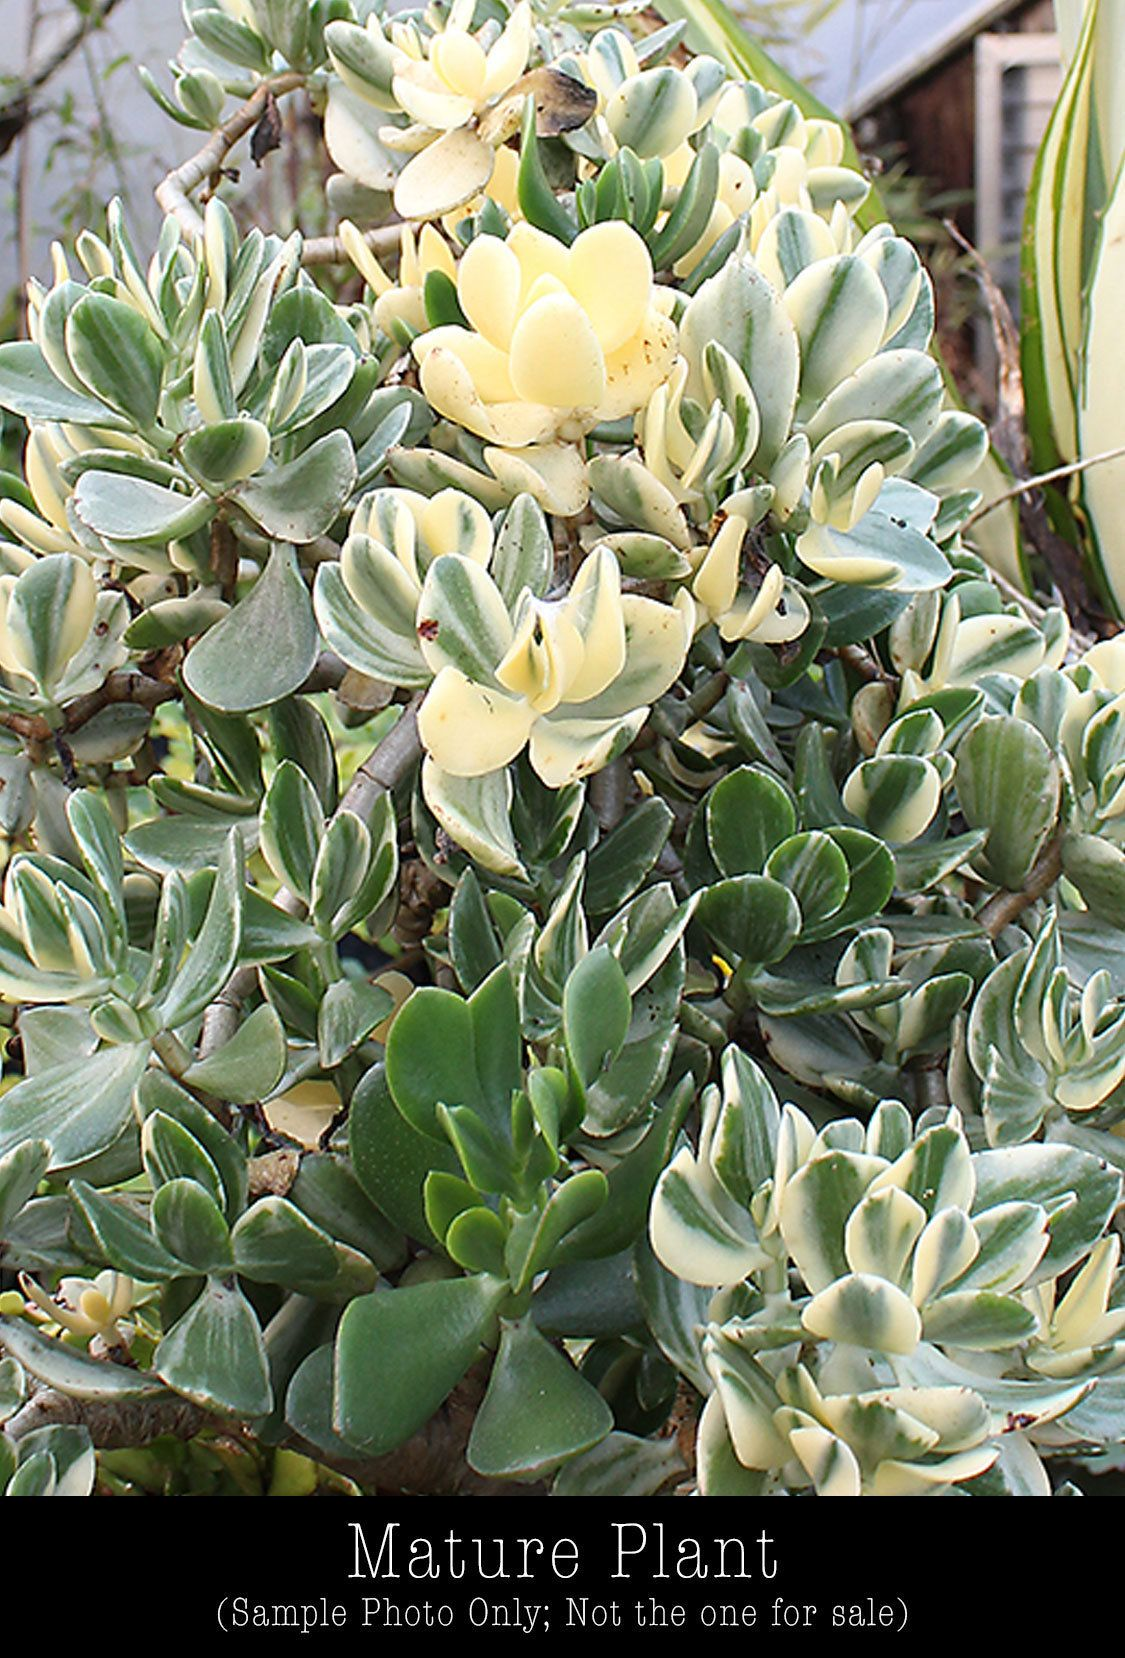 Crassula Ovata Variegata Cuttings Variegated Jade Plant Etsy Jade Plants Crassula Ovata Plant Cuttings